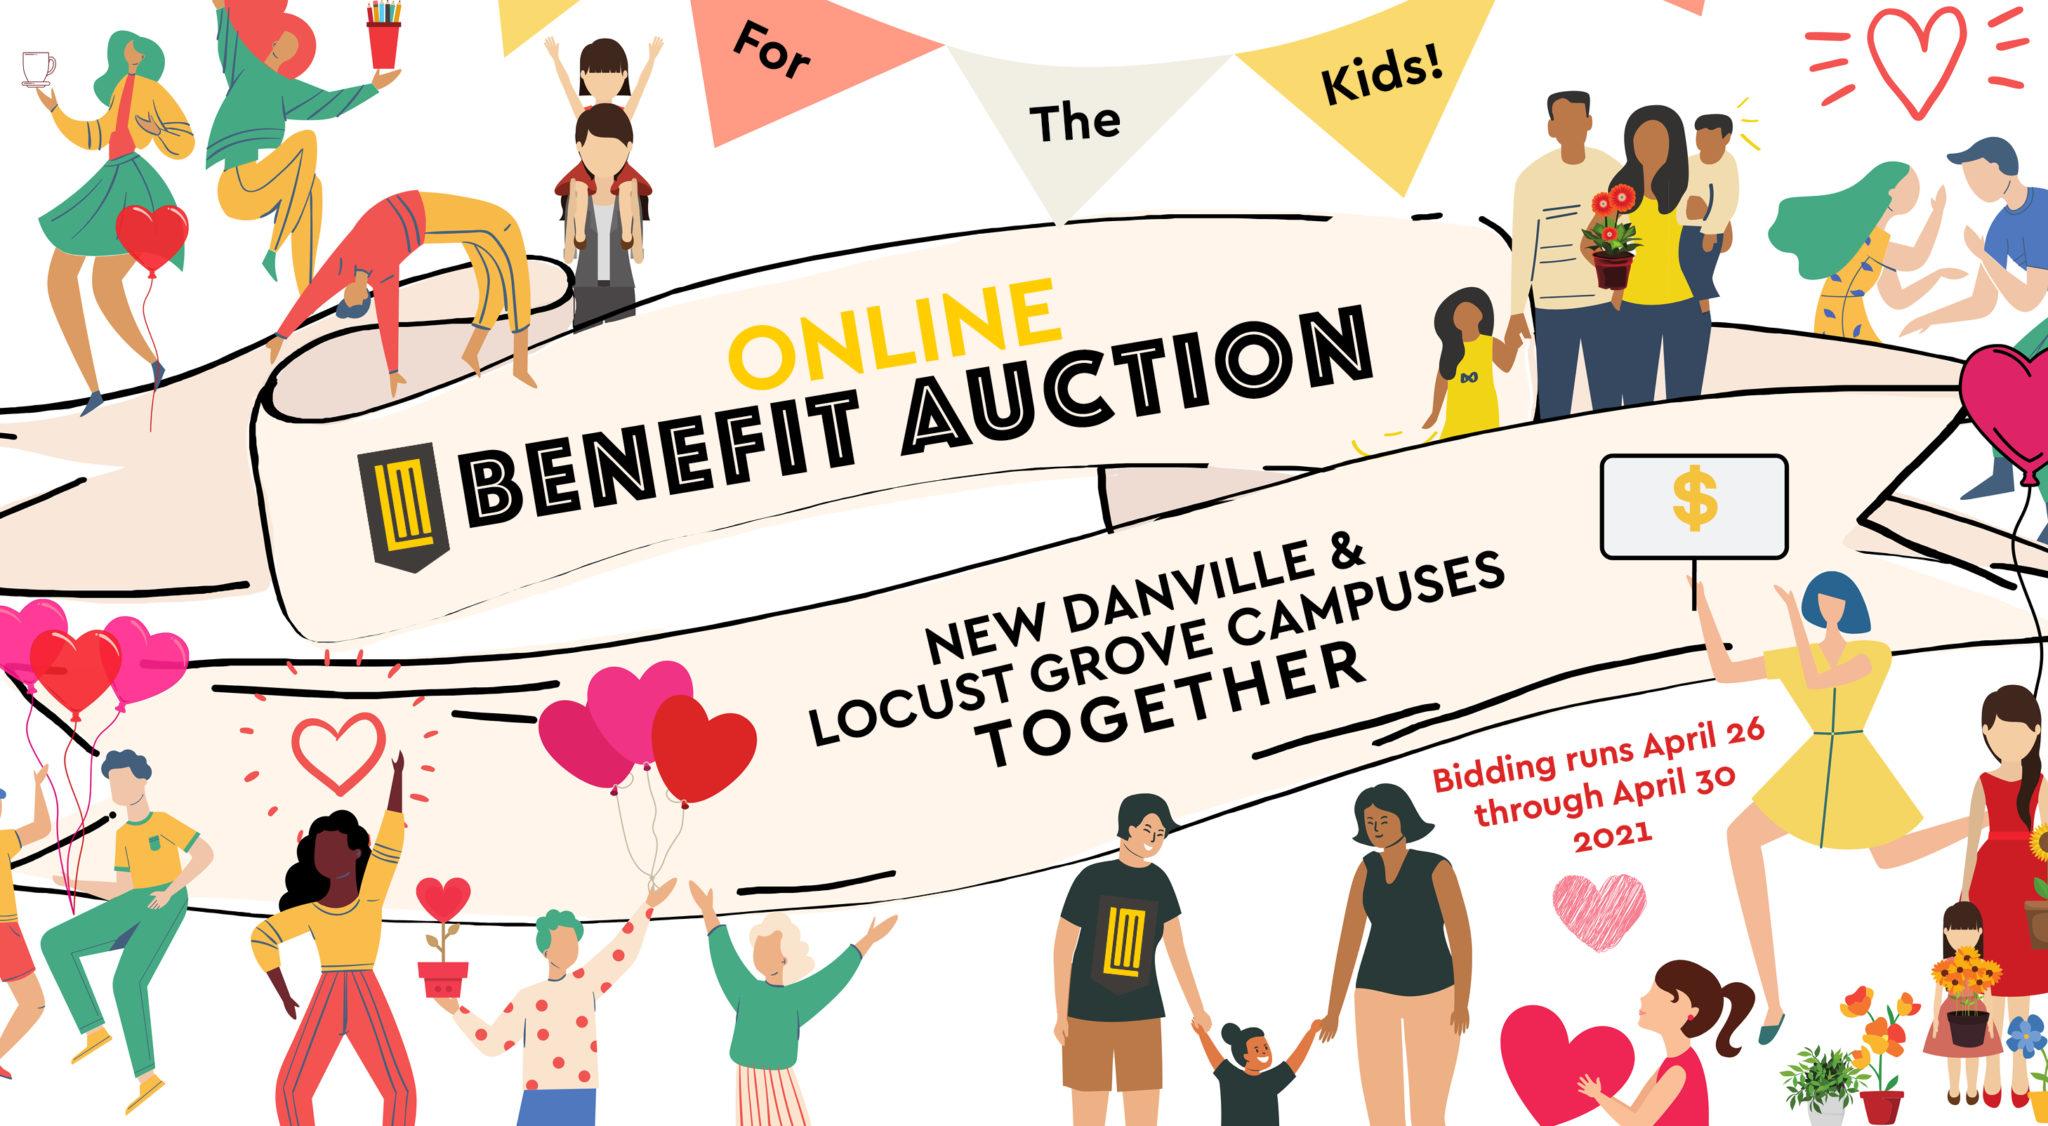 Auction Event Graphic 2021